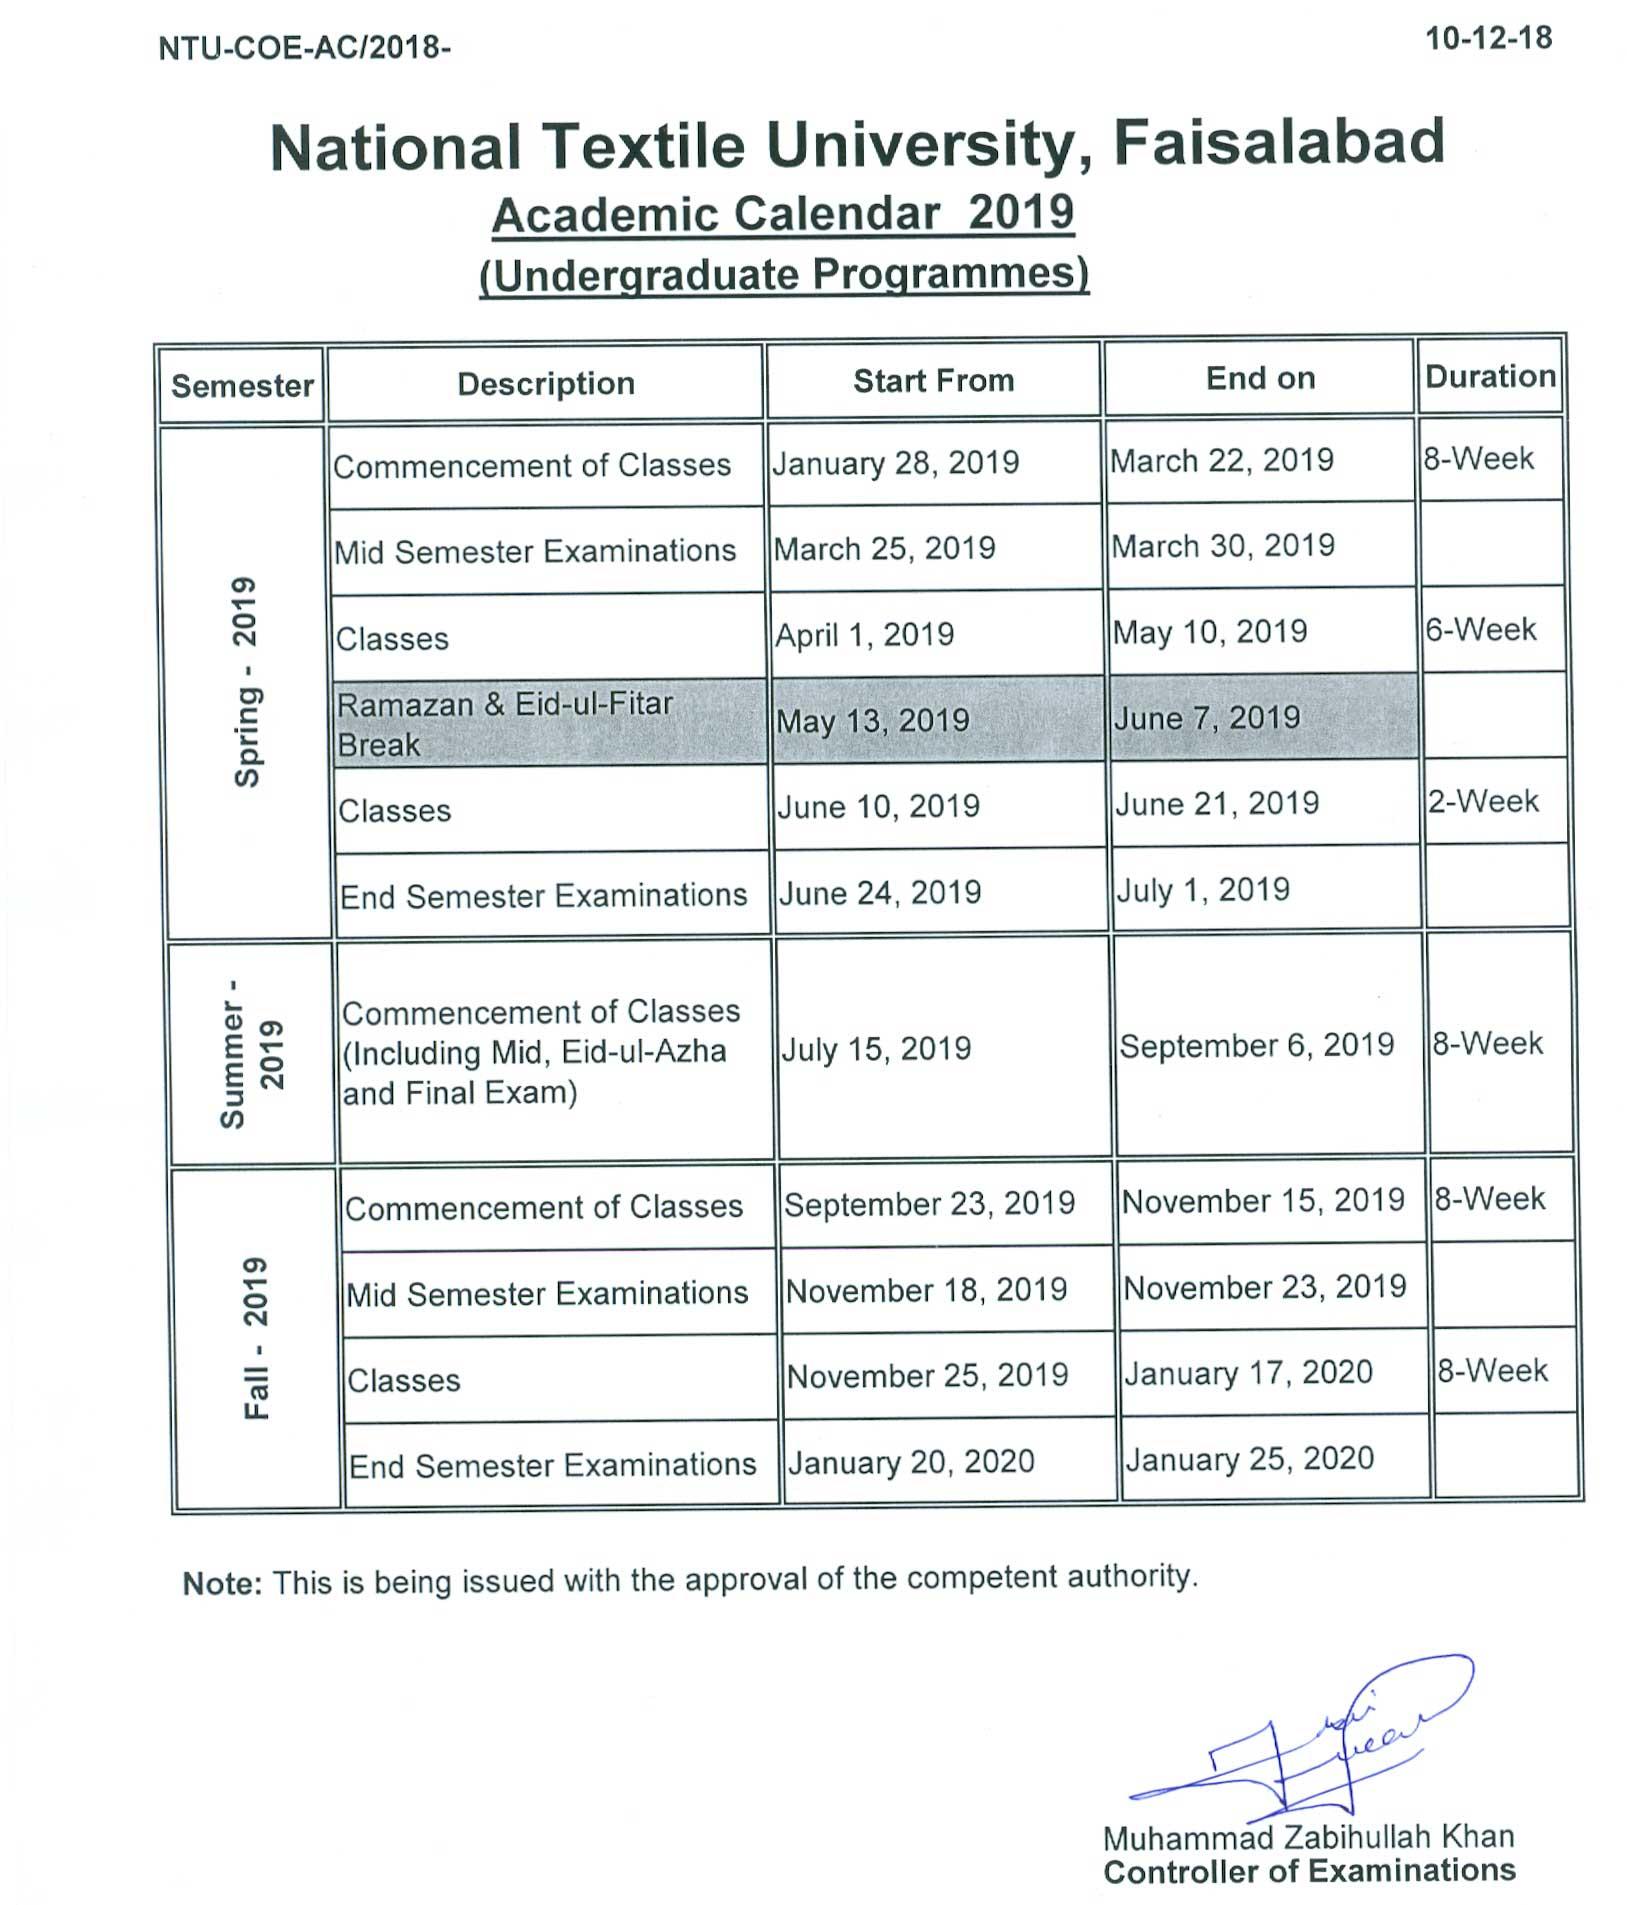 Academic Calendar - National Textile University Faisalabad | NTU